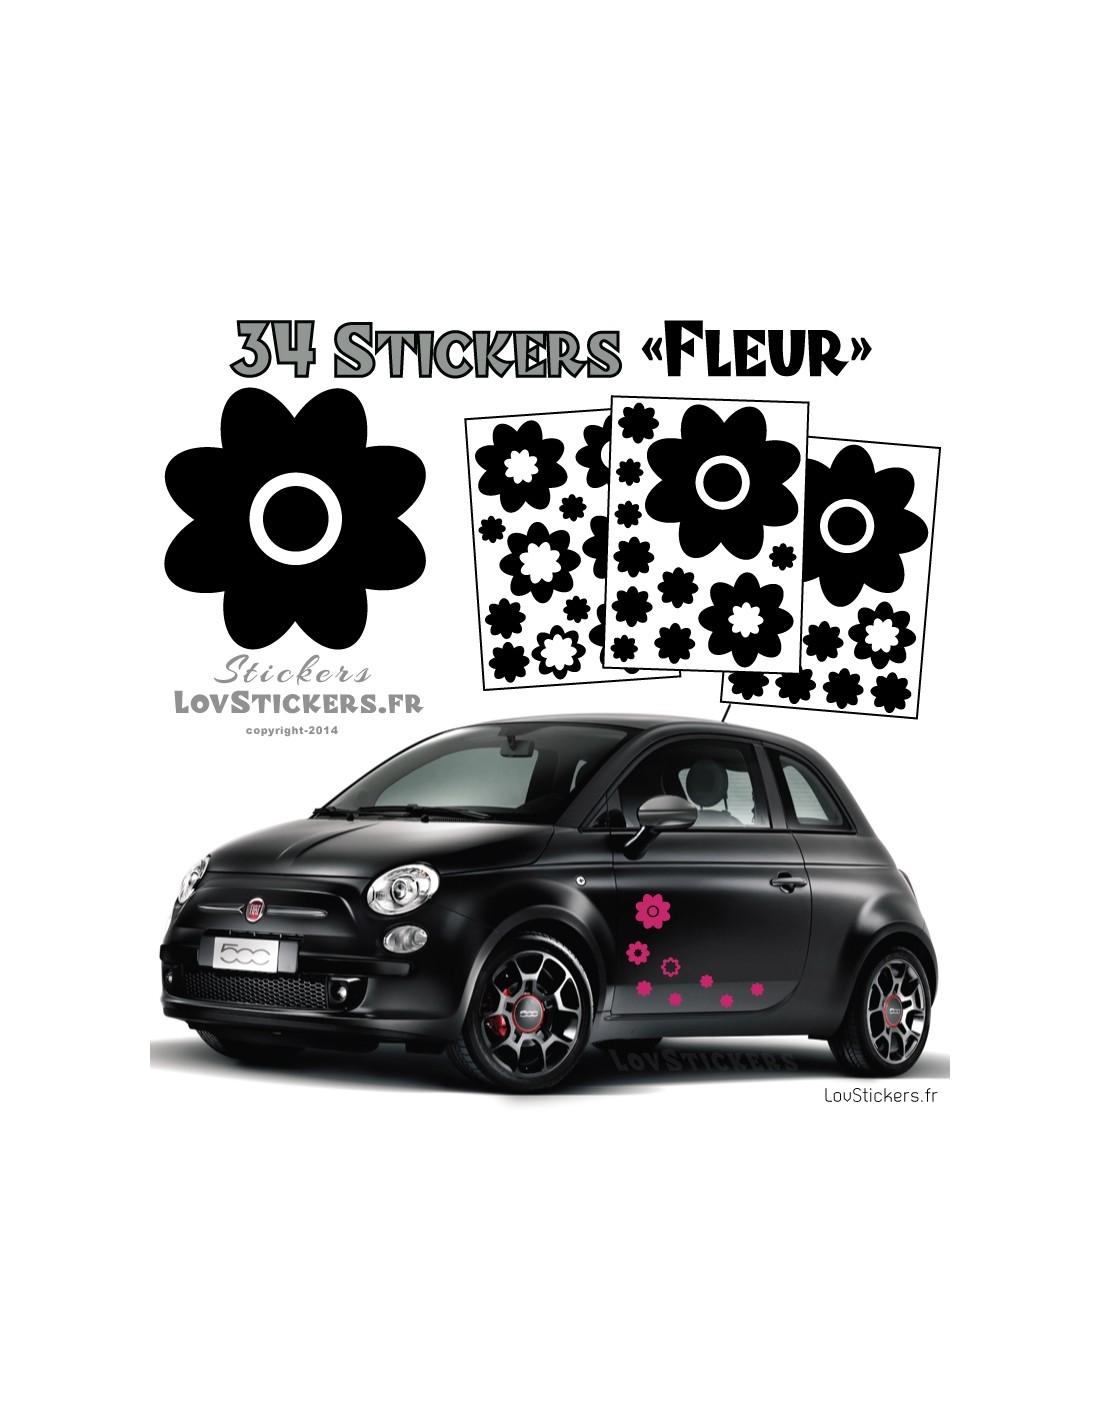 34 stickers fleurs deco 9 99. Black Bedroom Furniture Sets. Home Design Ideas